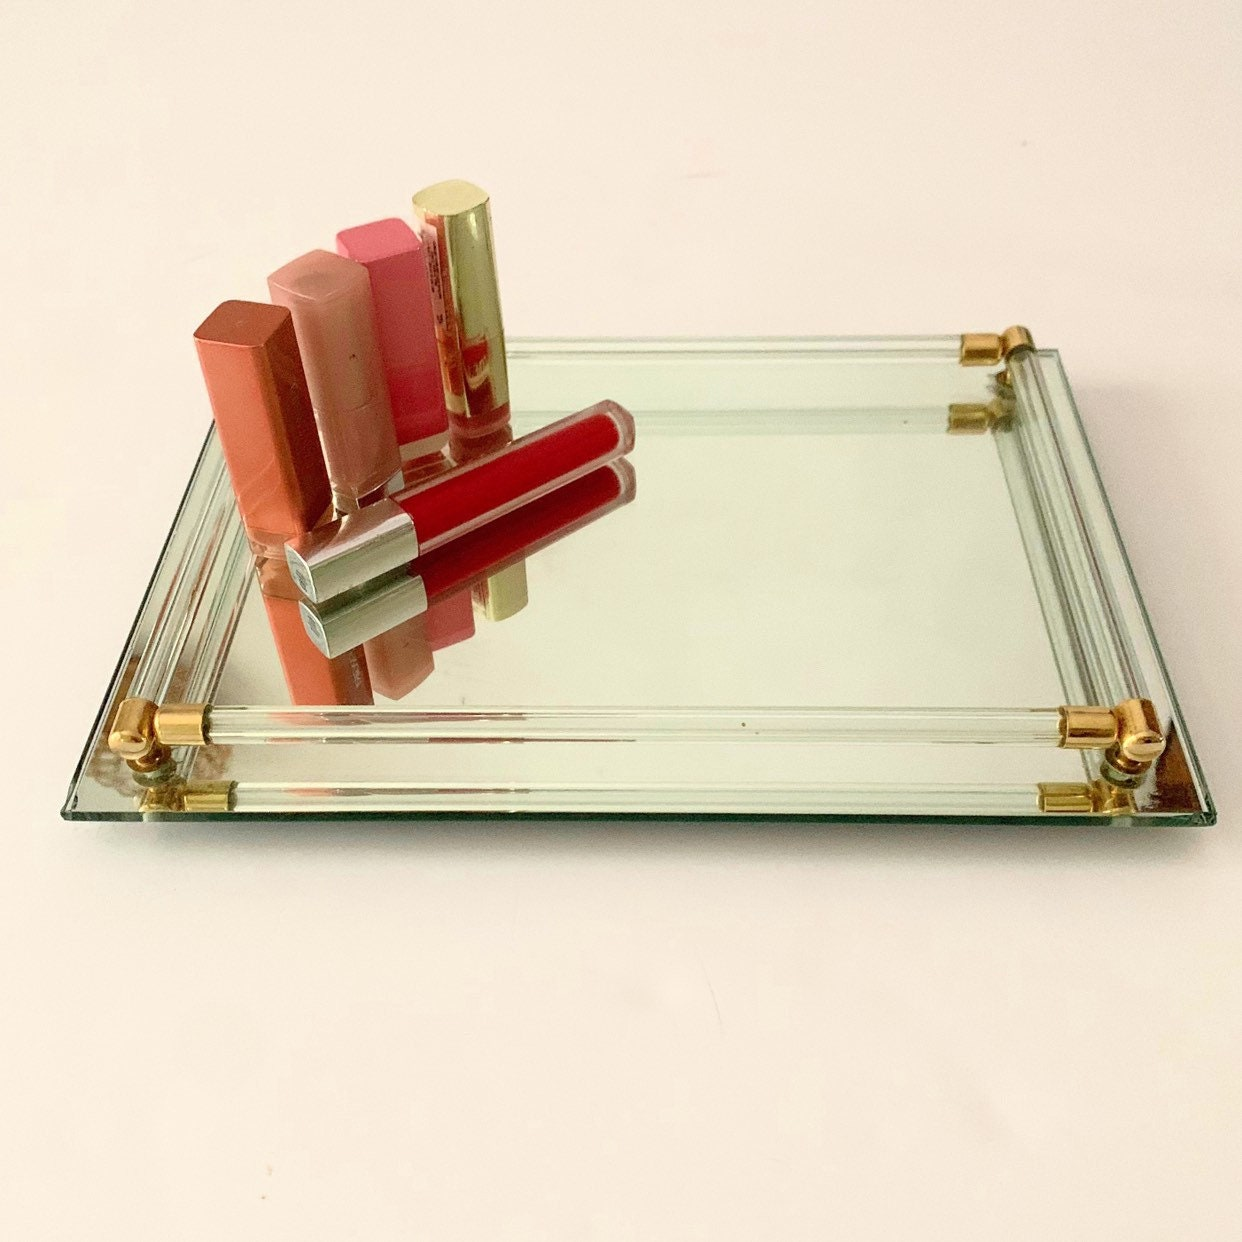 Vintage Vanity Tray Art Deco Decor Makeup Tray